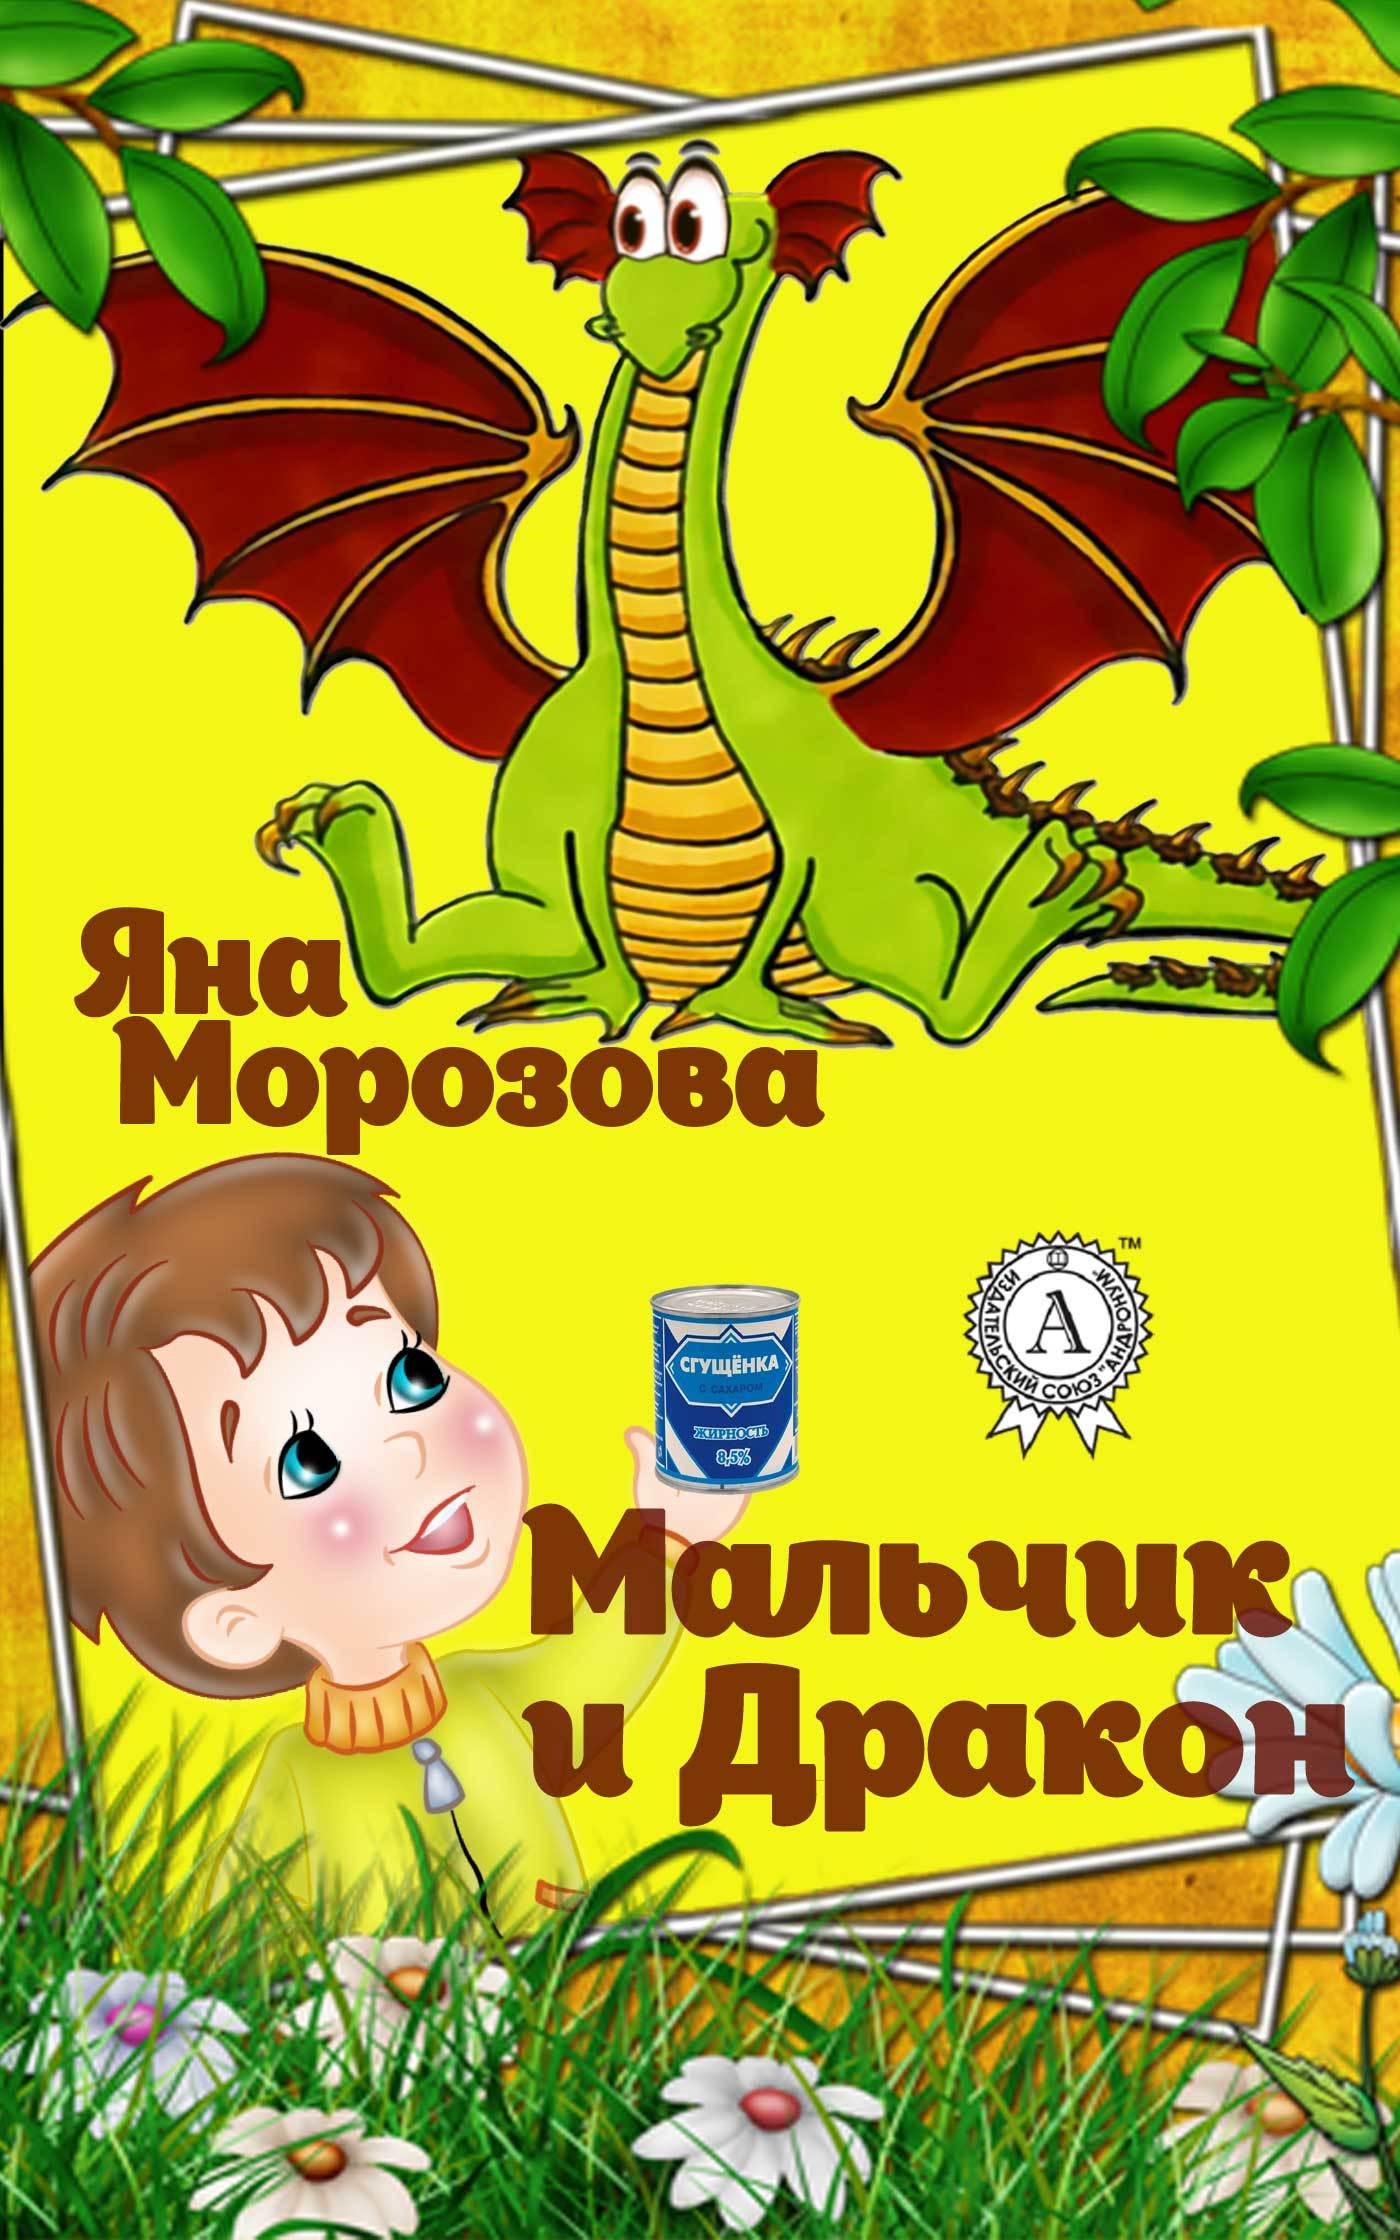 Яна Морозова «Мальчик и дракон»